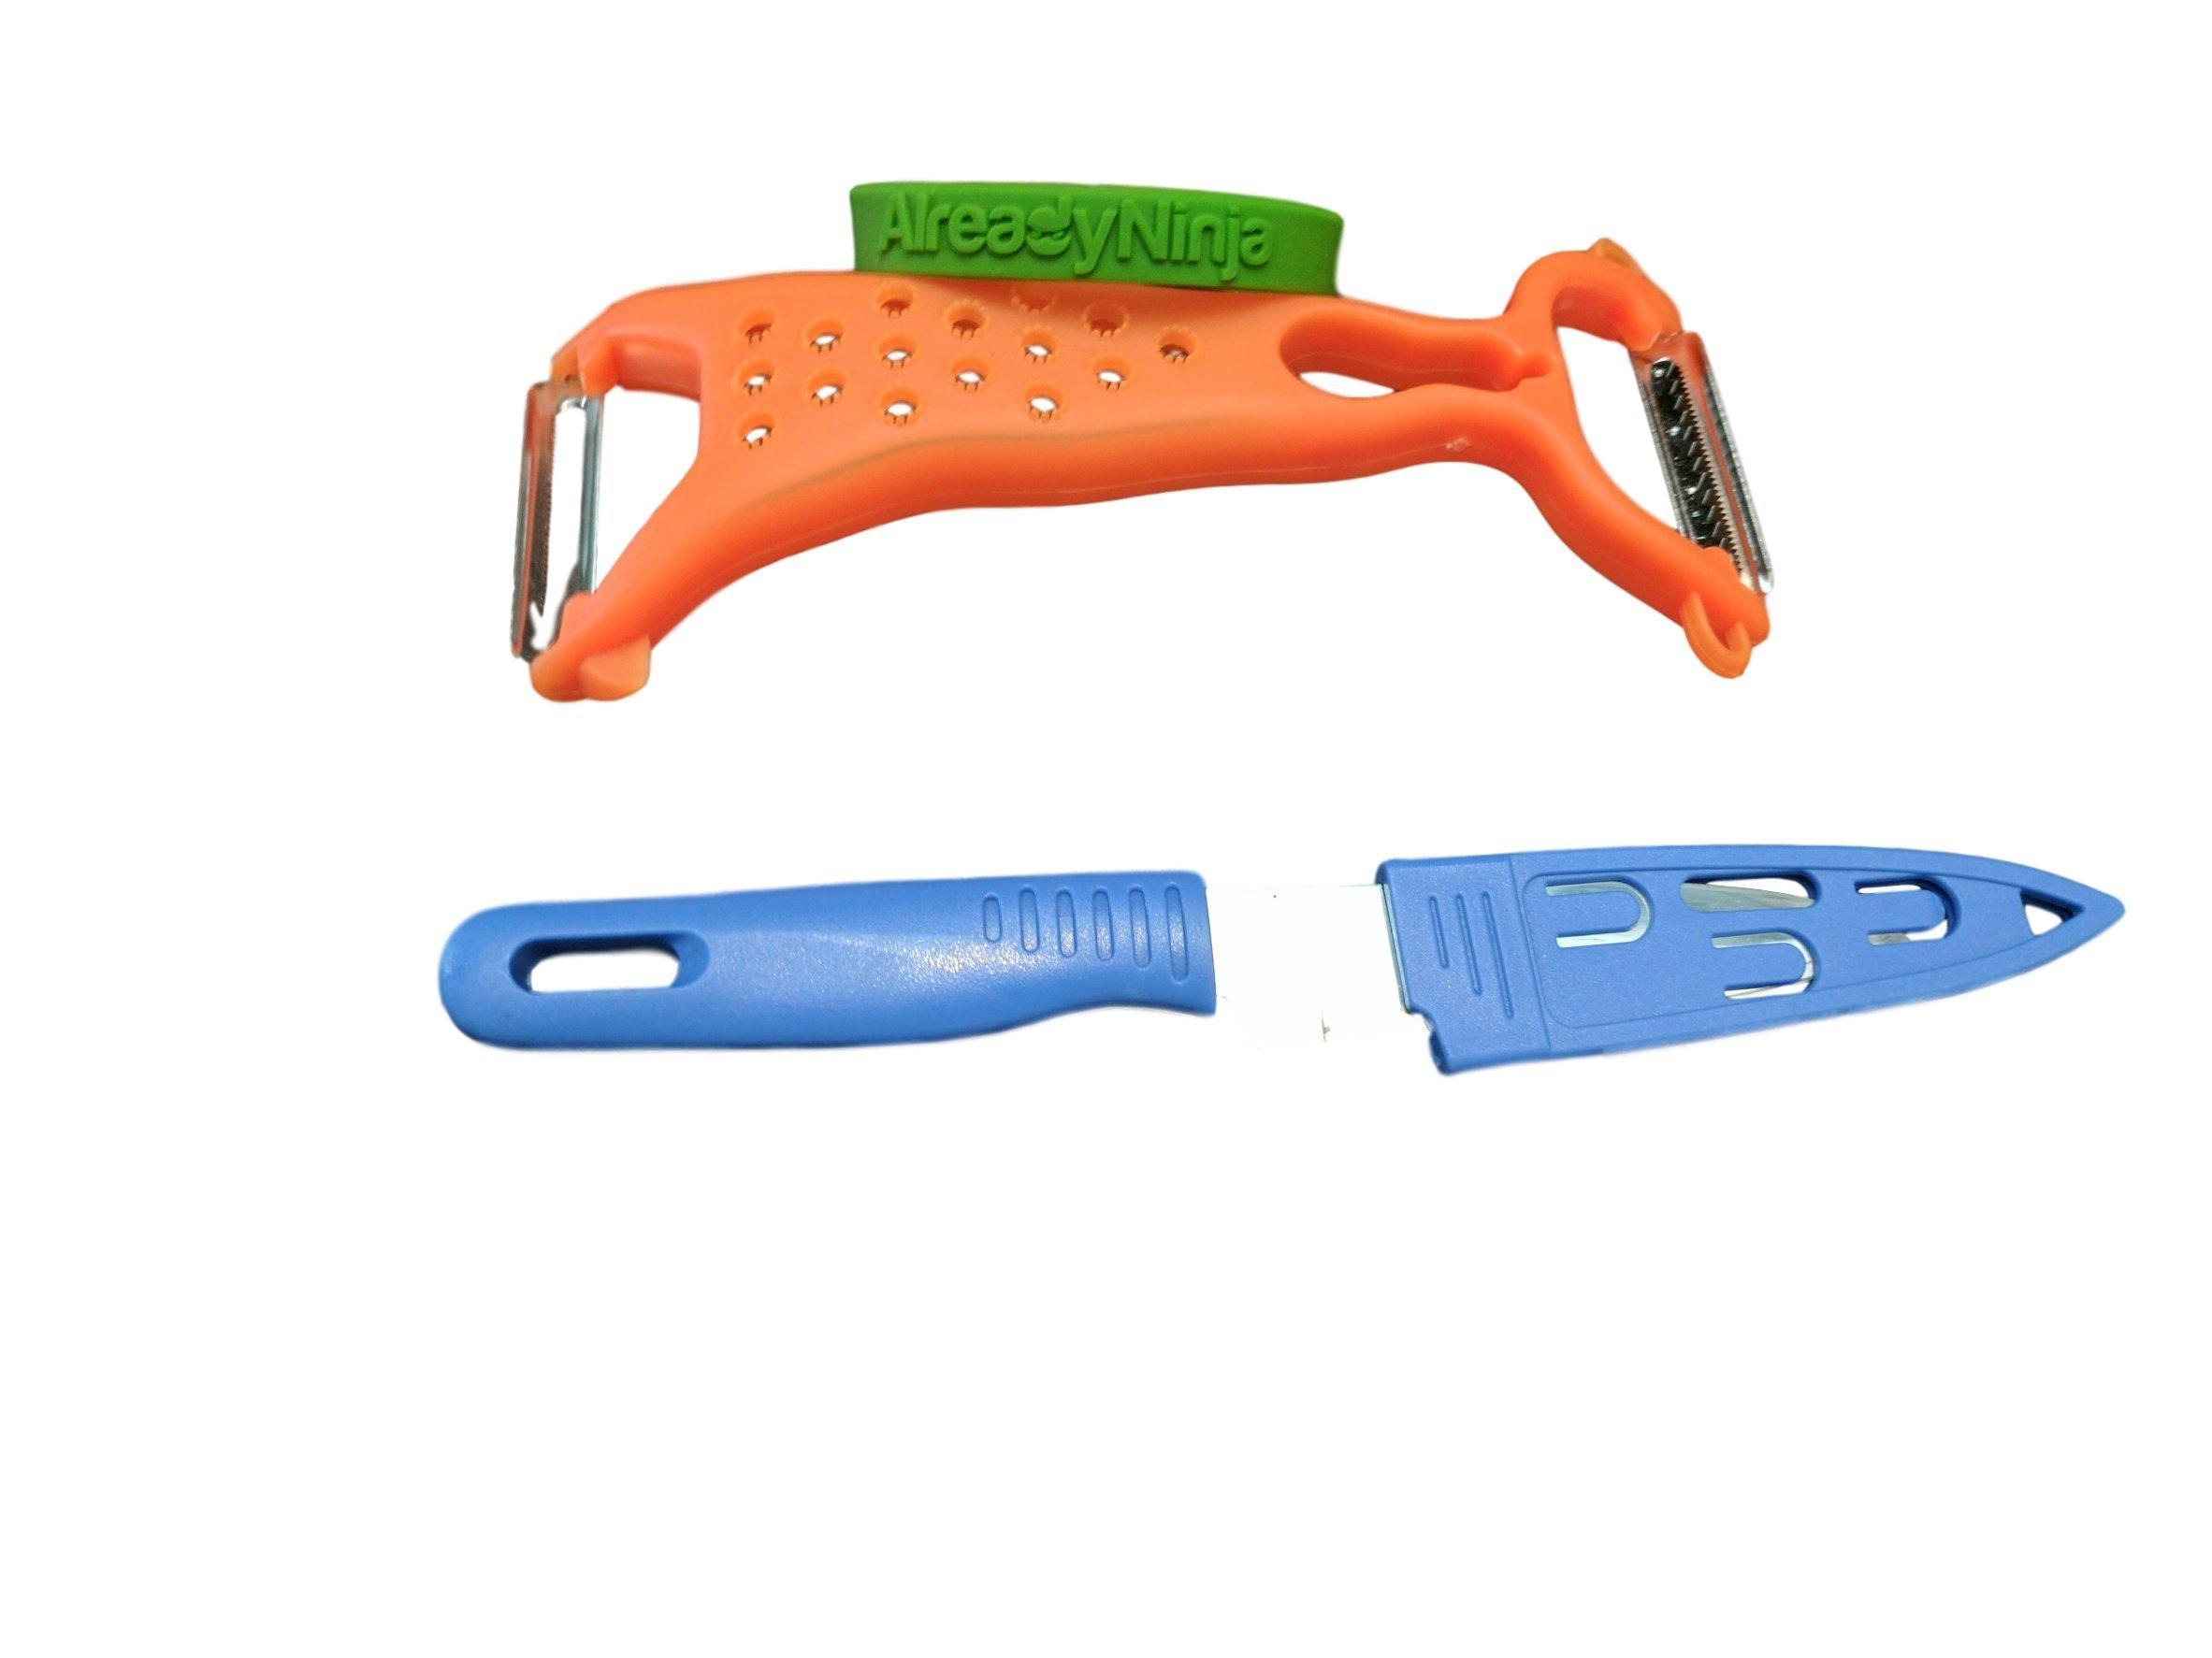 Already Ninja Kitchen Knife and Peeler Set by Already Ninja